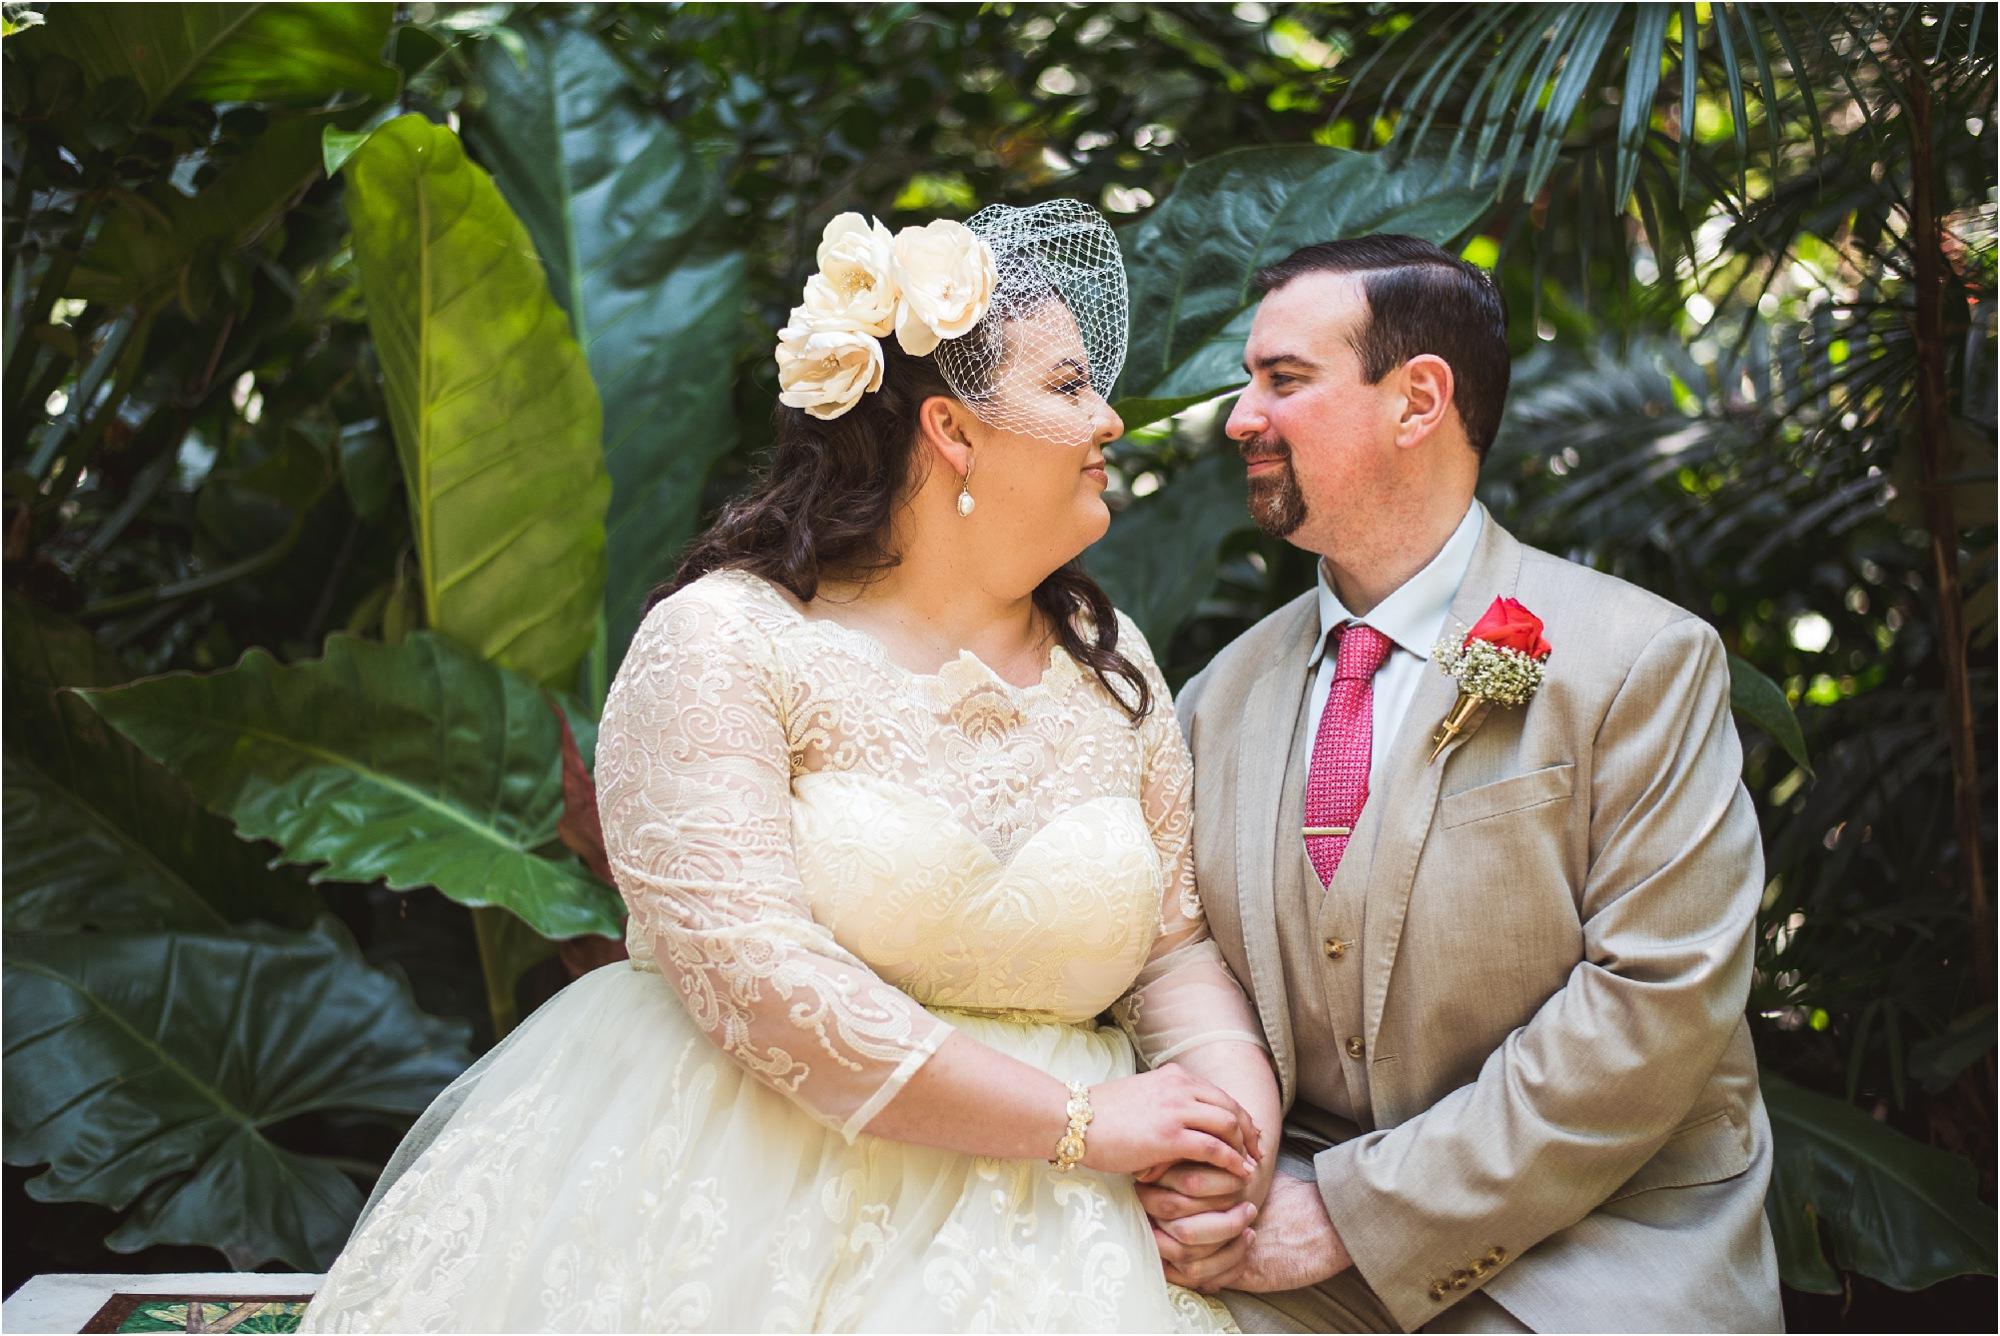 outdoor-rustic-pincrest-gardens-wedding-miami-photographer-jessenia-gonzalez_1019.jpg